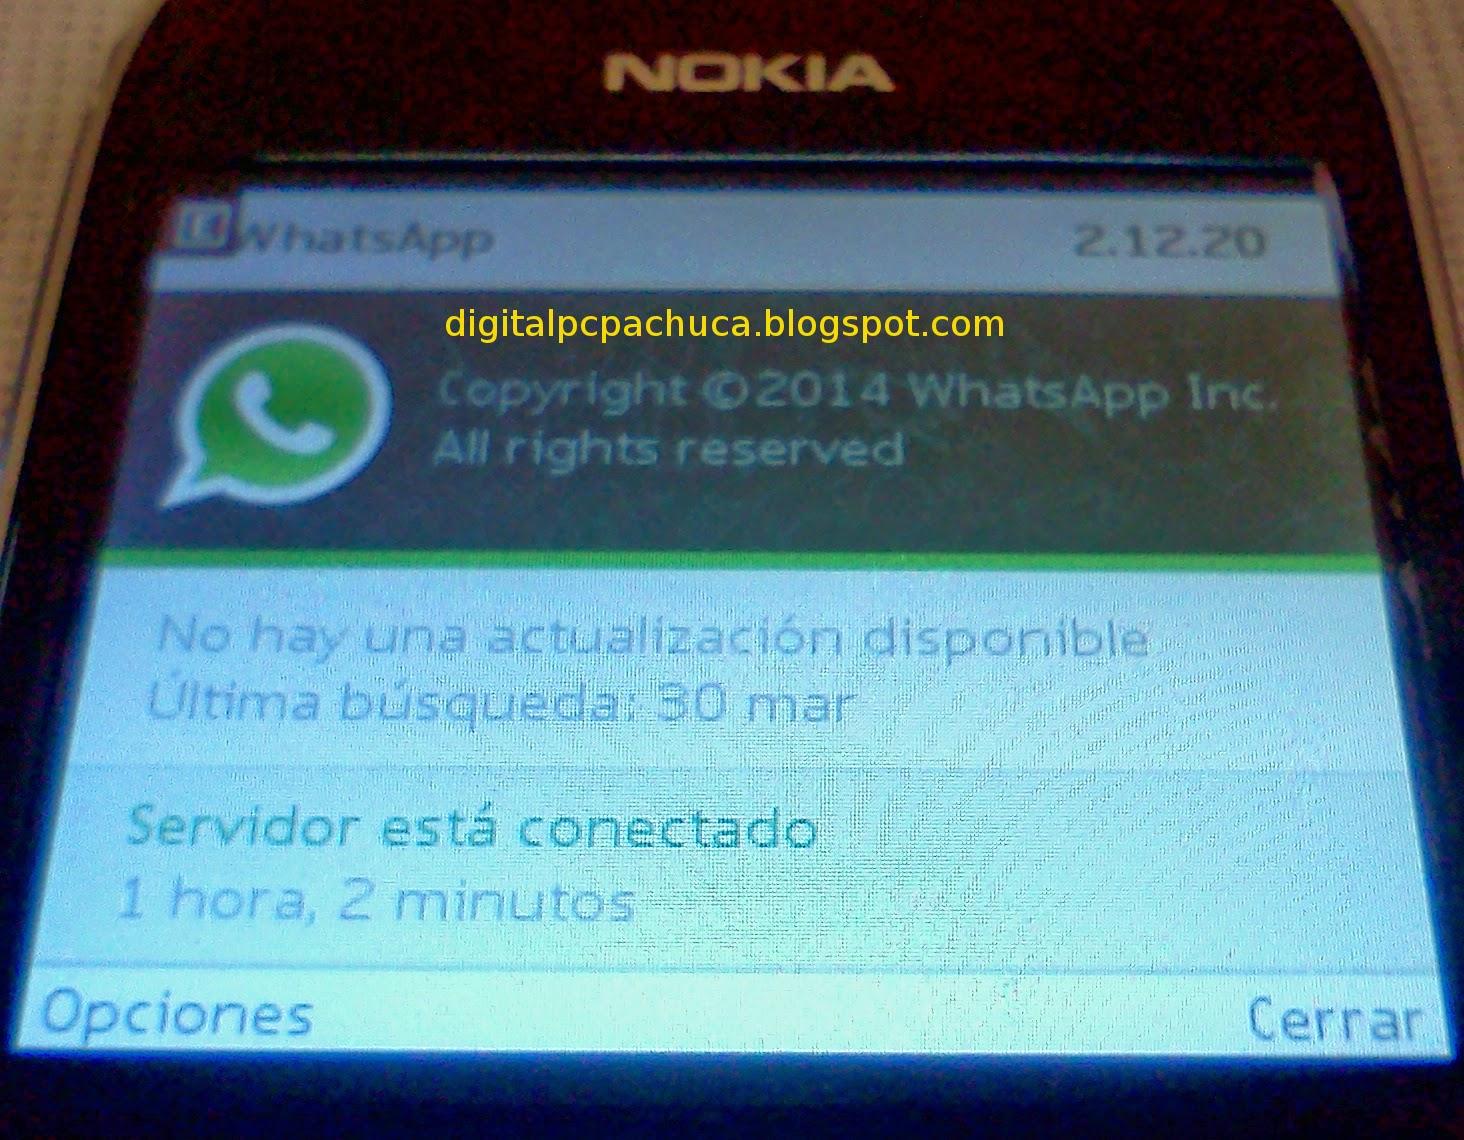 WhatsApp 2.12.20 para Nokia Asha S40